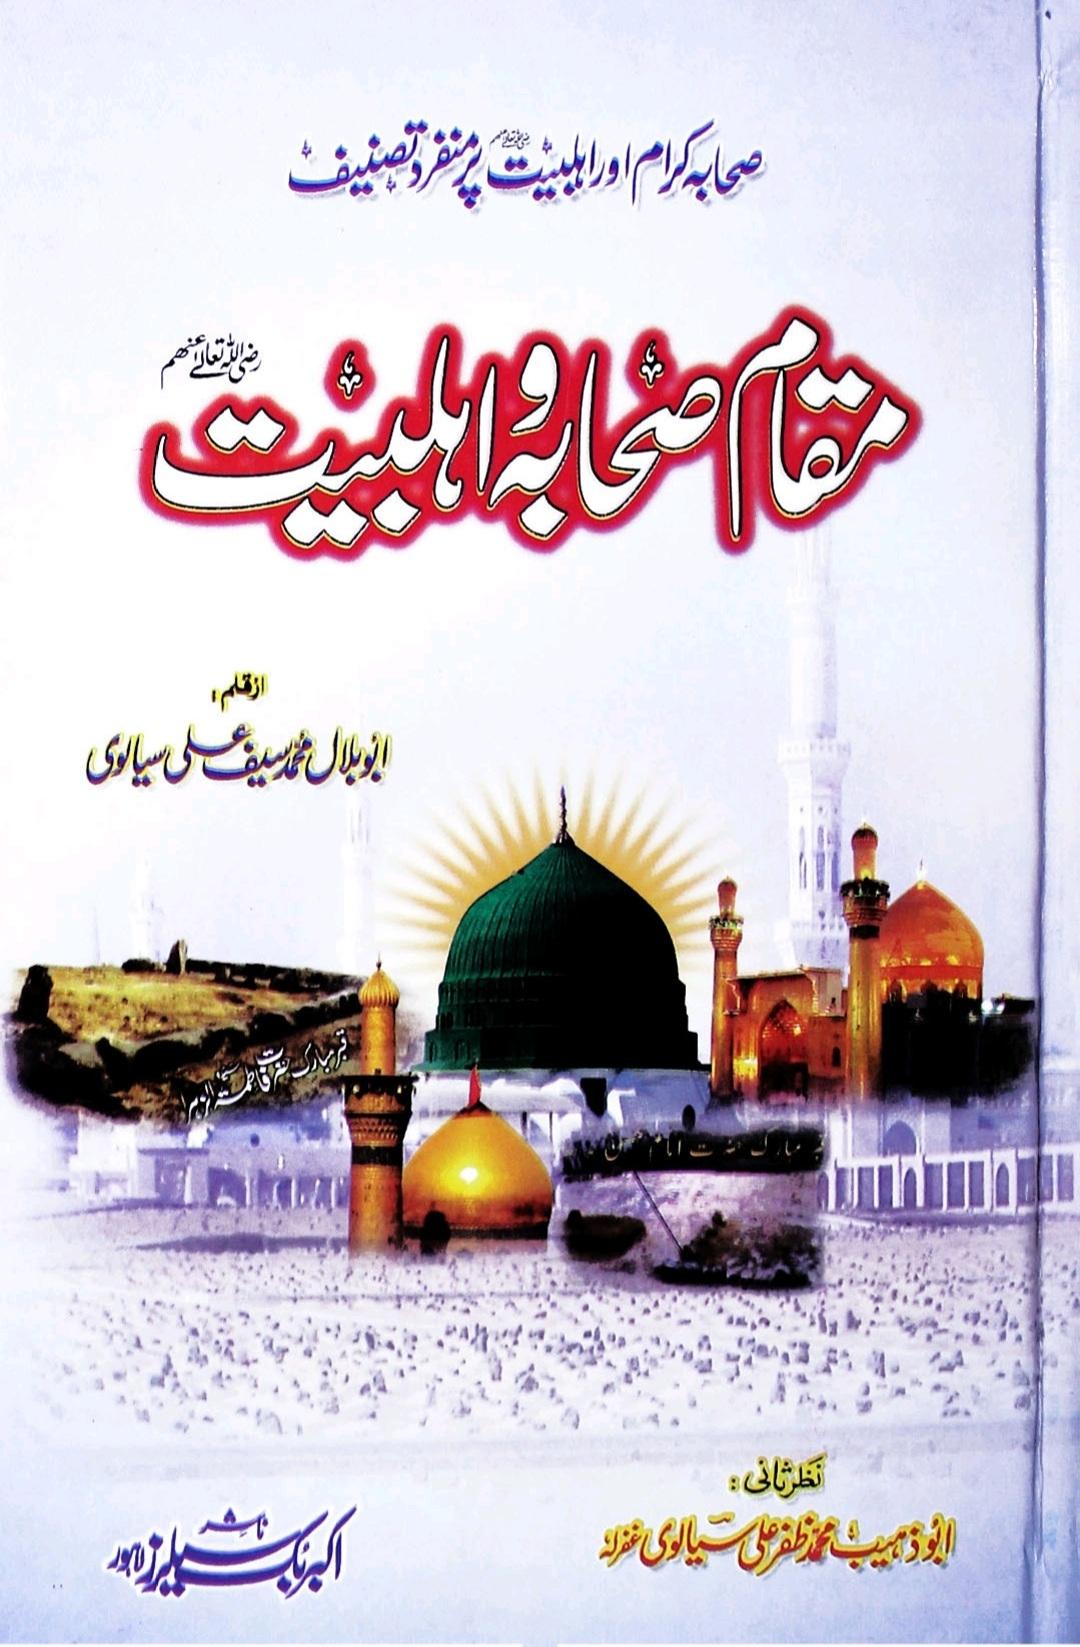 Muqam E Sahaba O Ahle Bait / مقام صحابہ و اہلبیت رضوان اللہ علیہم اجمعینby مولانا محمد سیف علی سیالوی